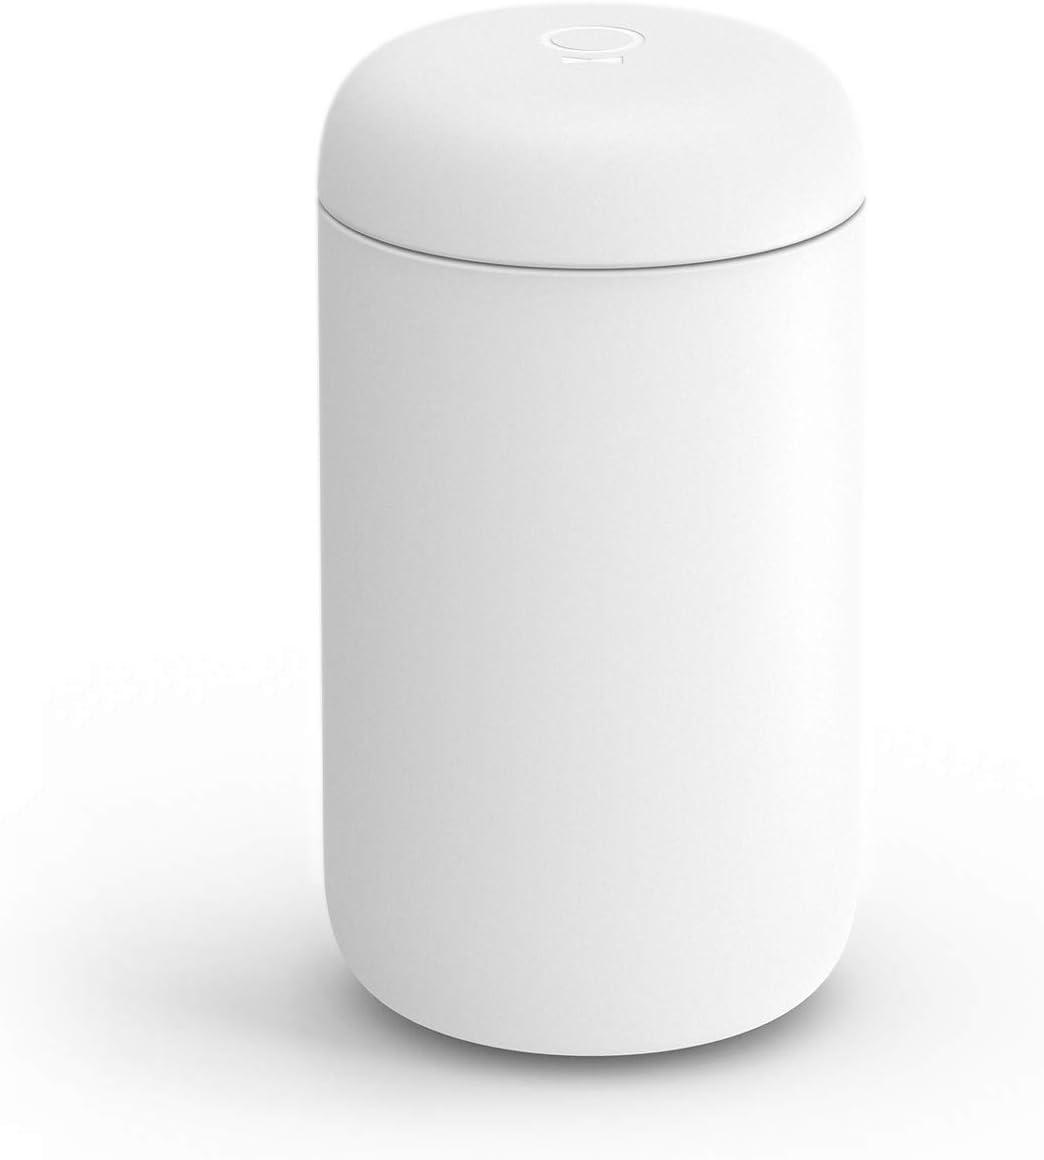 Fellow Carter Everywhere Mug, Vacuum Insulated w/True Taste Ceramic Coating, Matte White 16oz